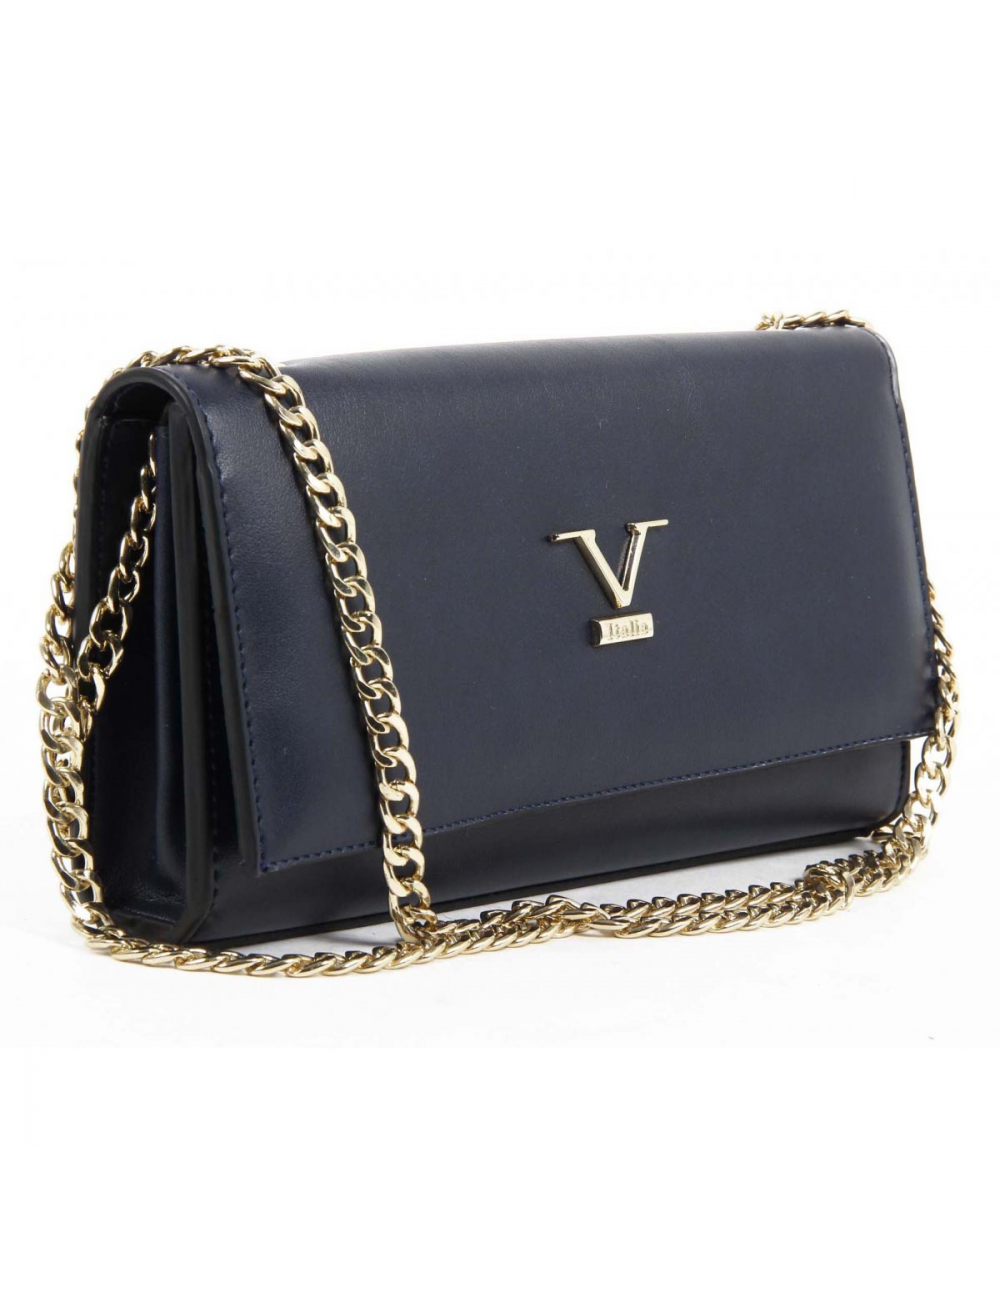 73.81$  Watch now - http://vimws.justgood.pw/vig/item.php?t=9lln5628528 - Versace 19.69 Abbigliamento Sportivo Srl Milano Italia Handbag VE011 Dark Blue 73.81$